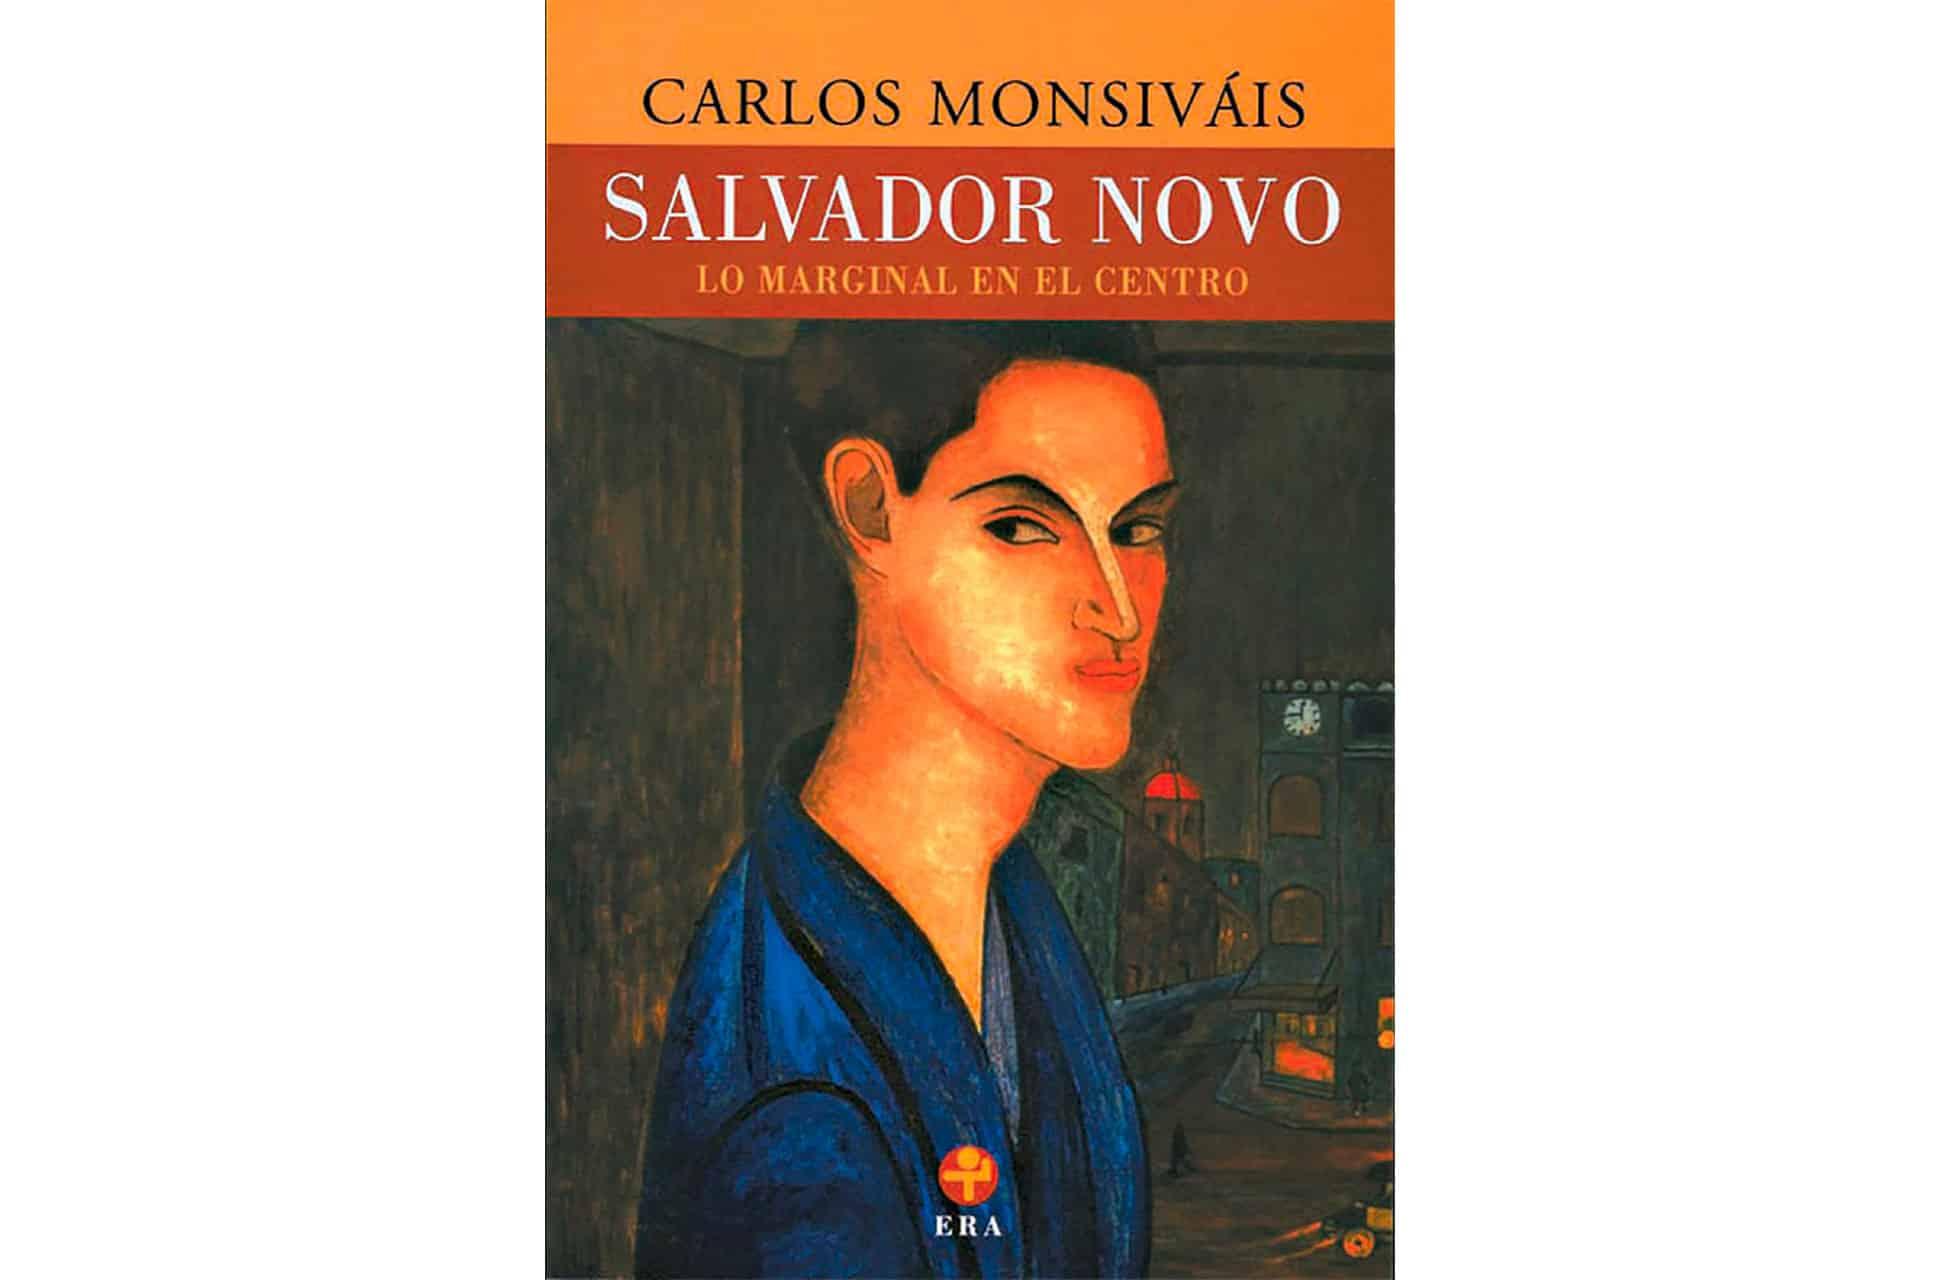 Literatura LGBTQ+ salvador-novo-carlos-monsivais